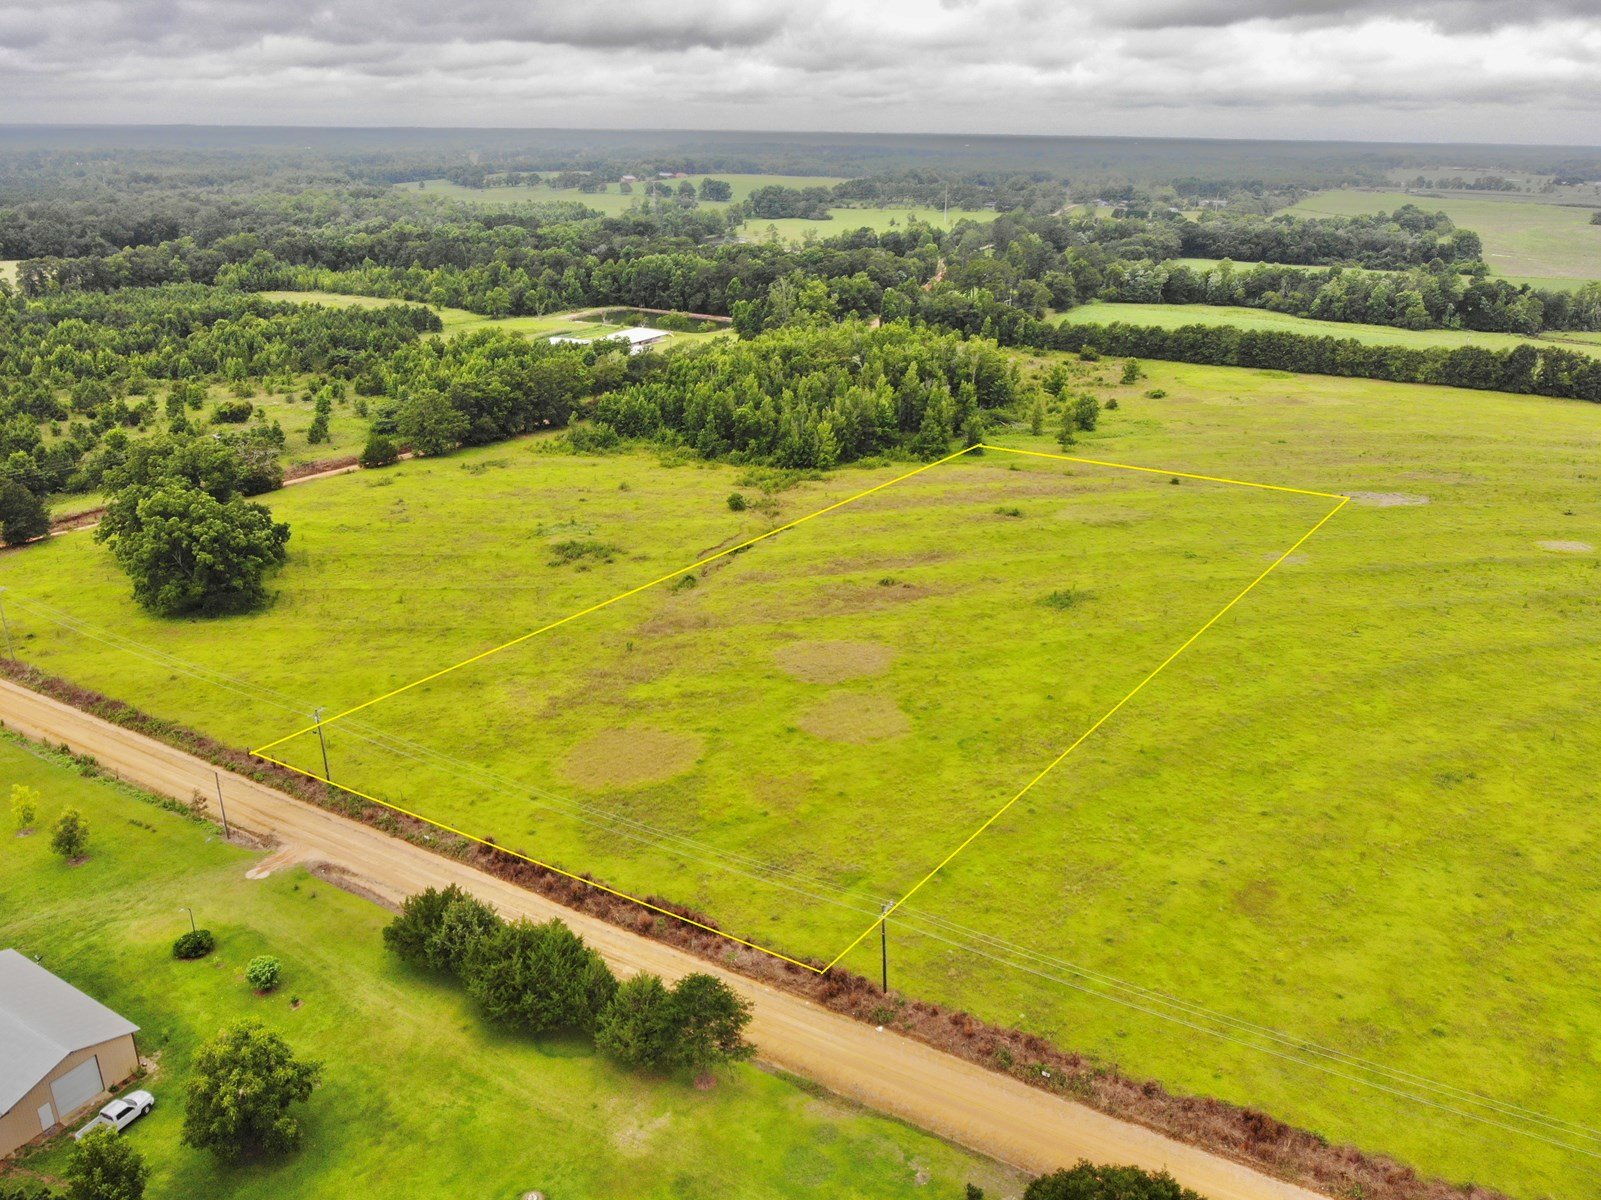 4.3ac Land for Sale Slocomb Alabama - Geneva County AL